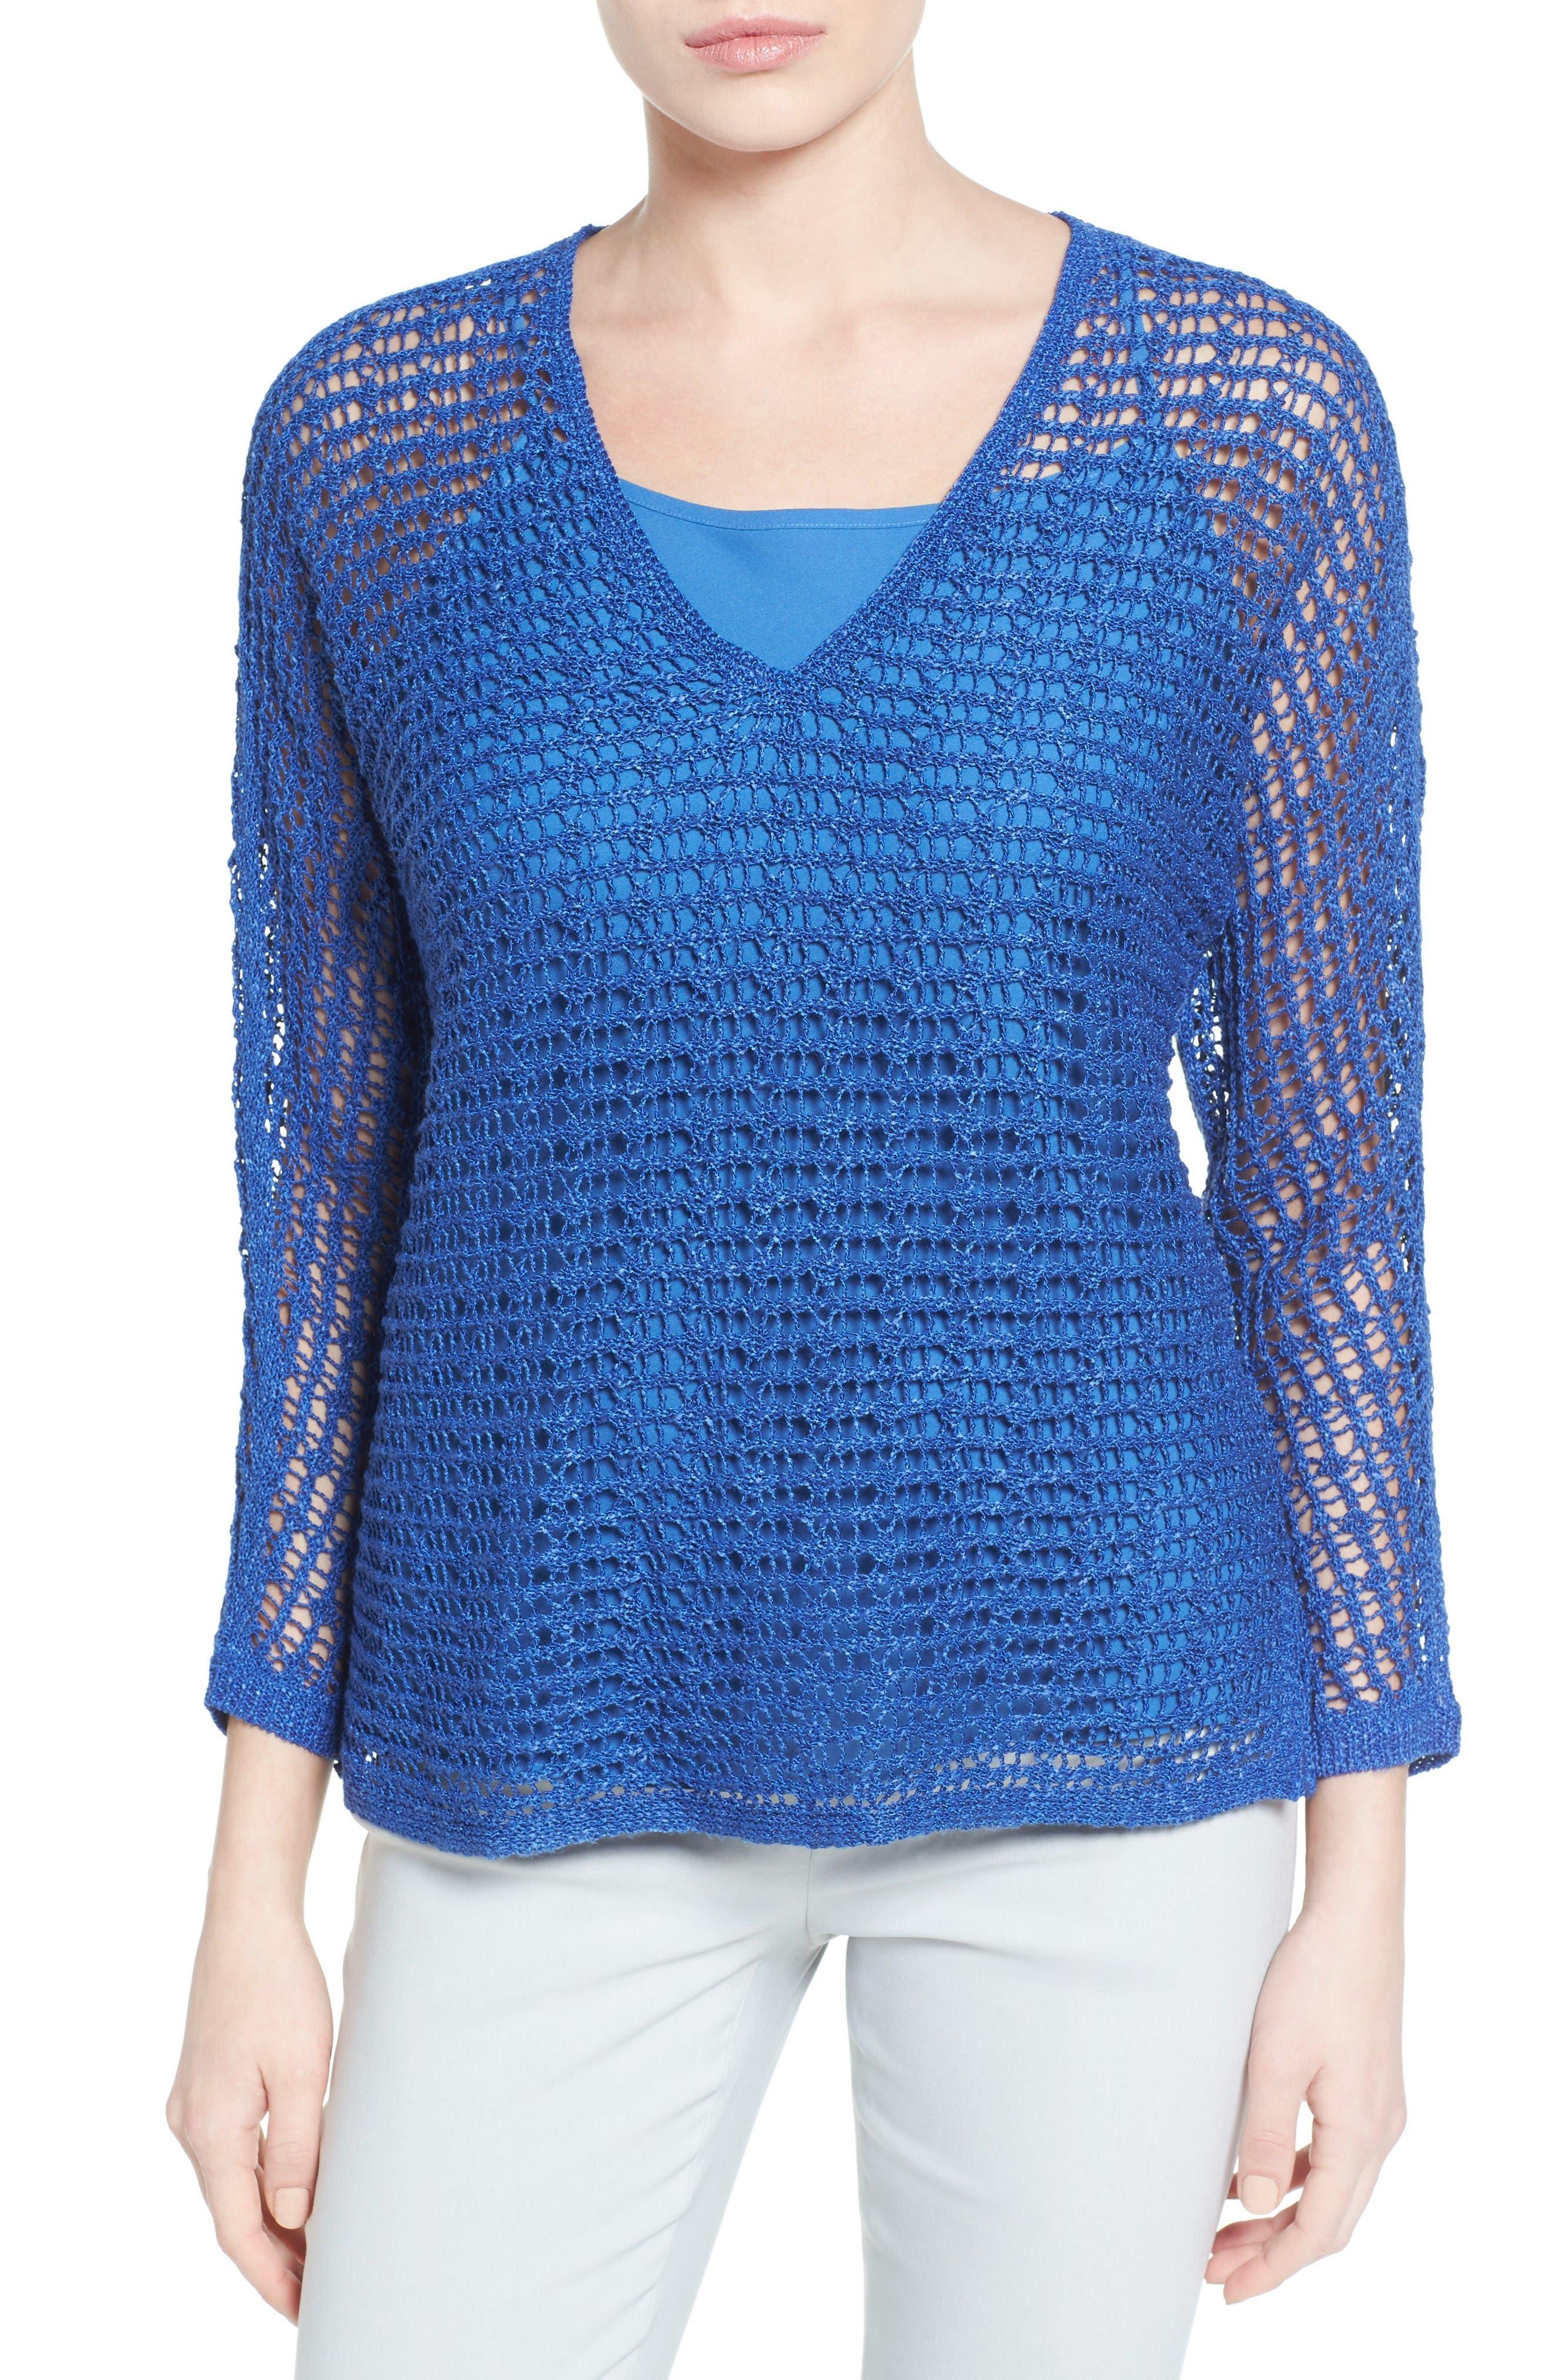 NIC+ZOE Sun Catcher Crochet Top